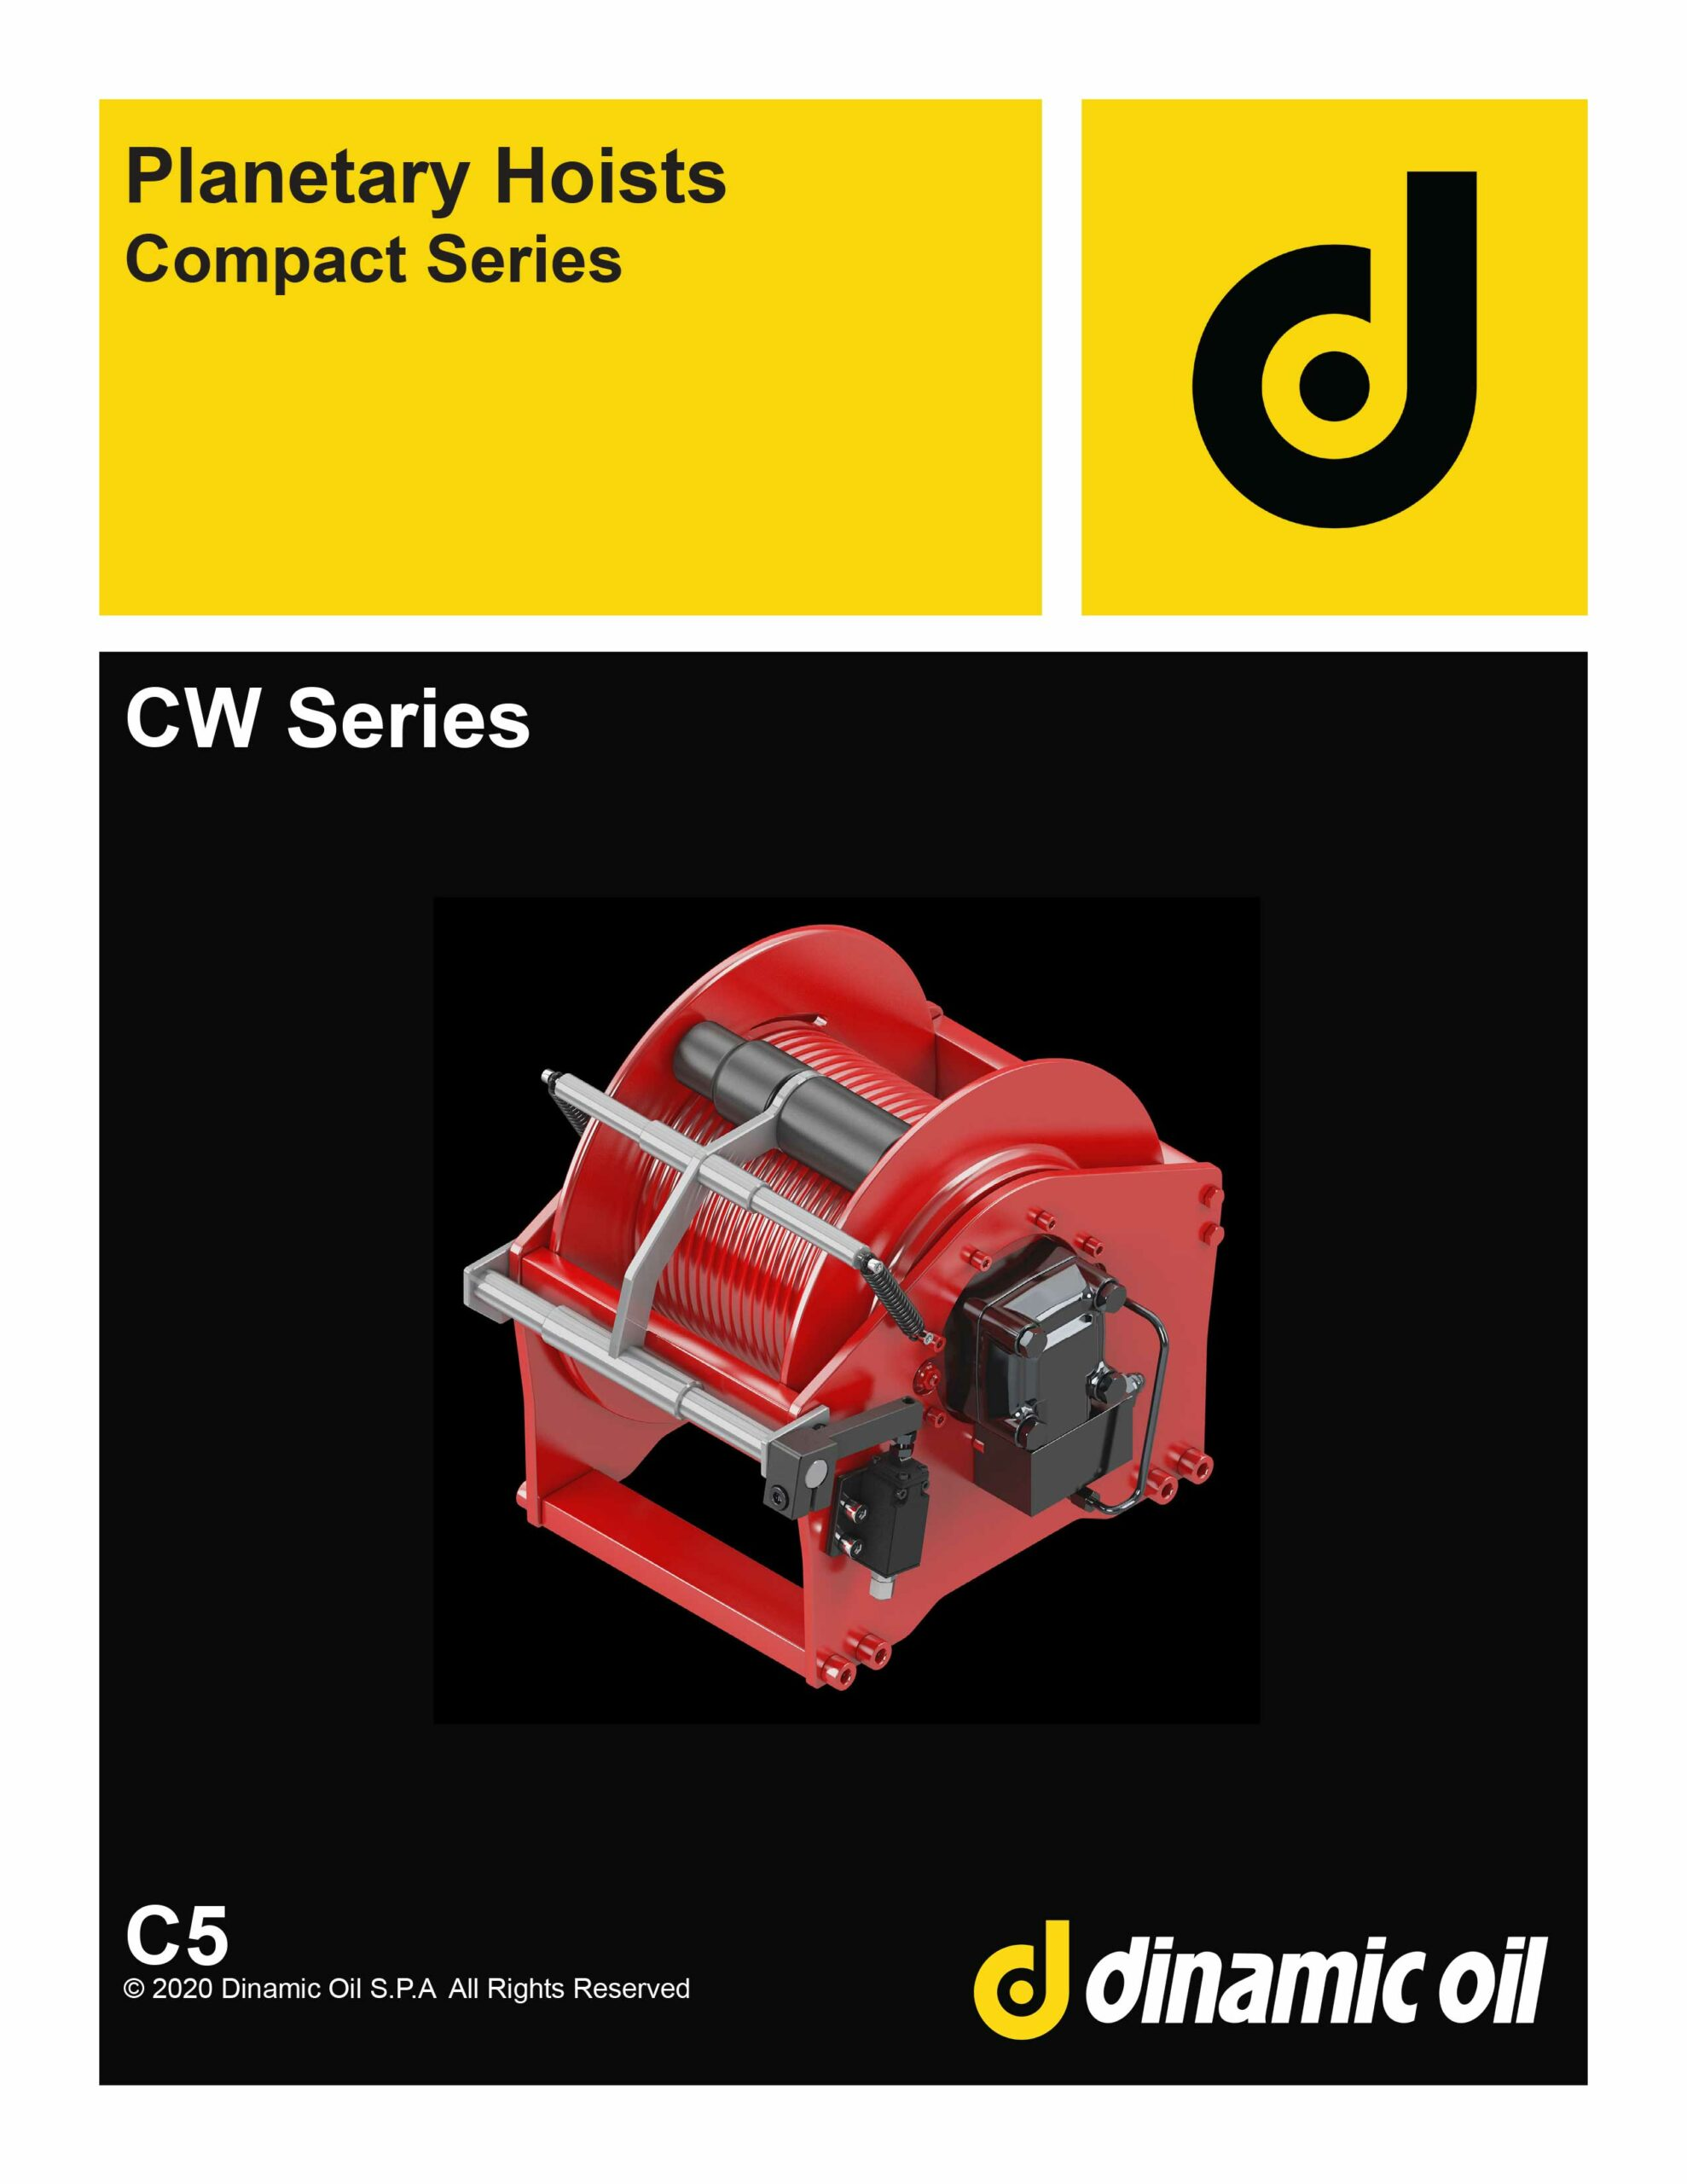 Dinamic Oil Hoist (CW Series) Catalog C5